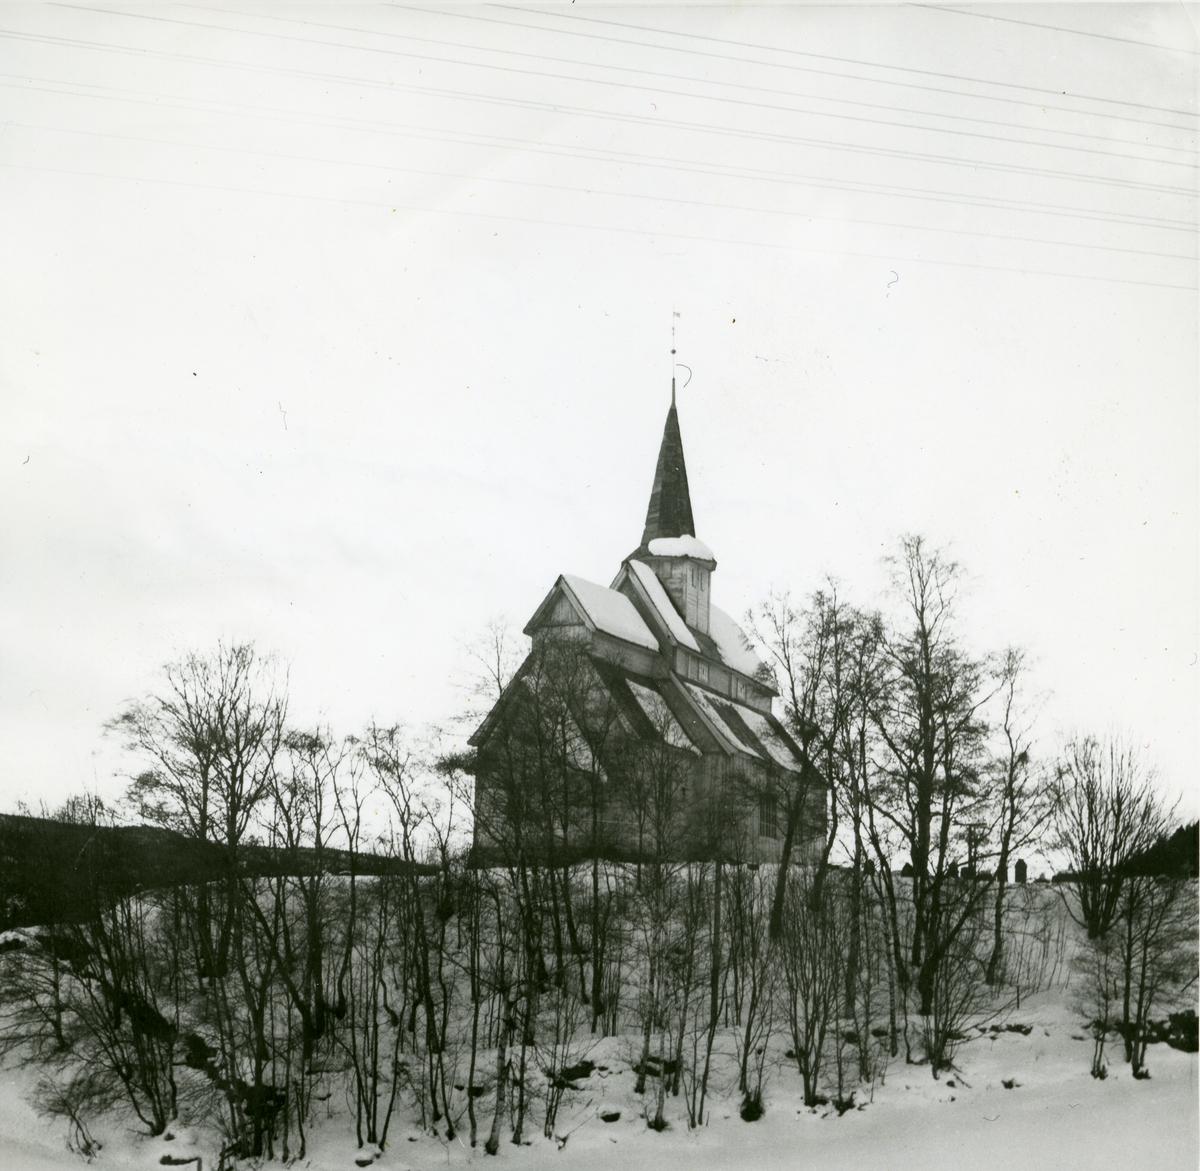 Høre stavkirke i Vang,Valdres.